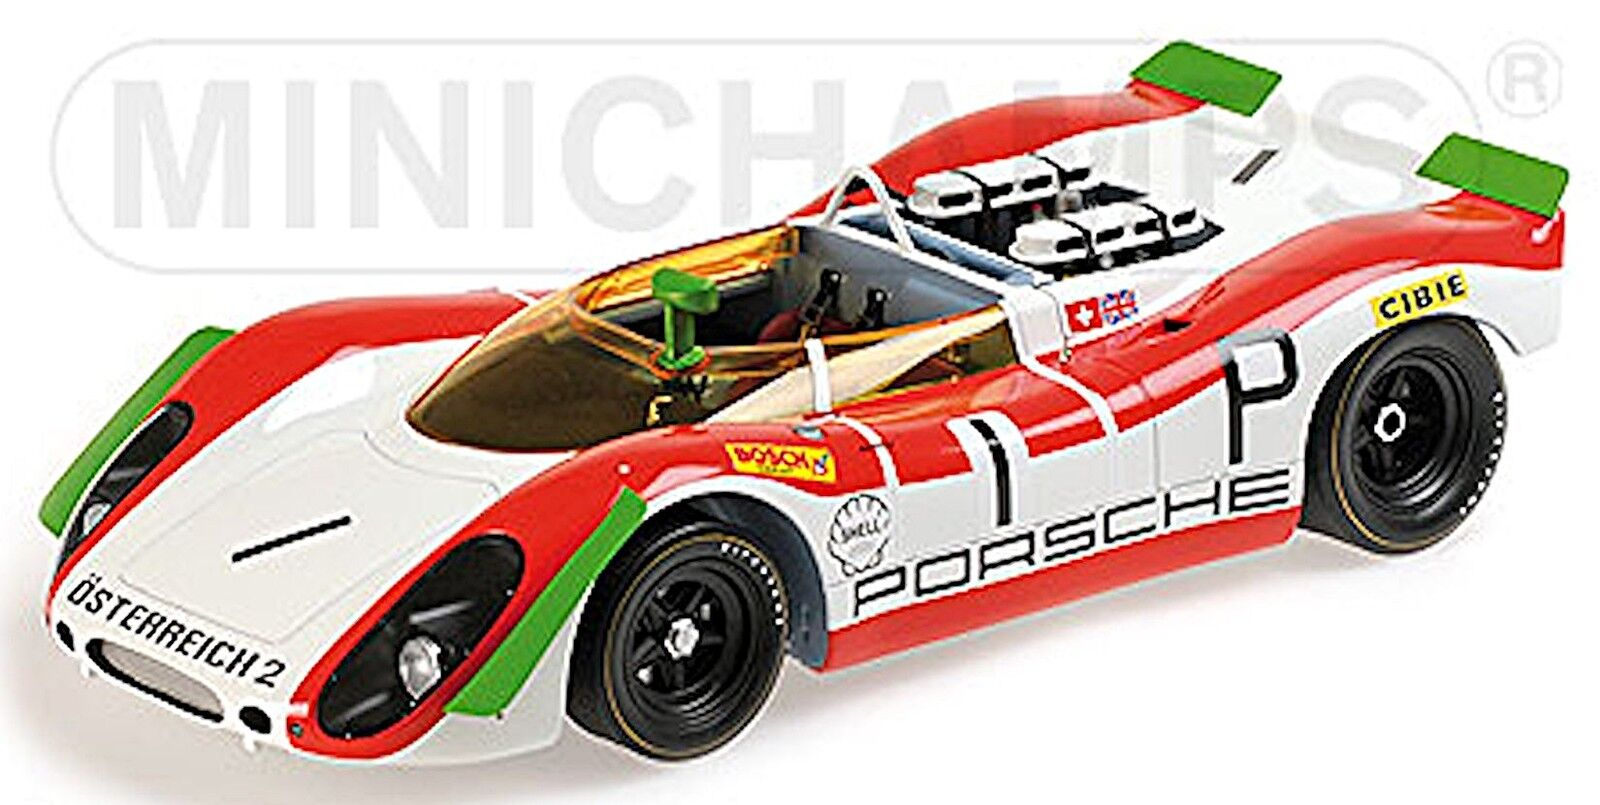 PORSCHE 908 02 SPYDER 1000 km NURBURGRING 1969  1 rossoman MAMMOLO 1 18 Minichamps